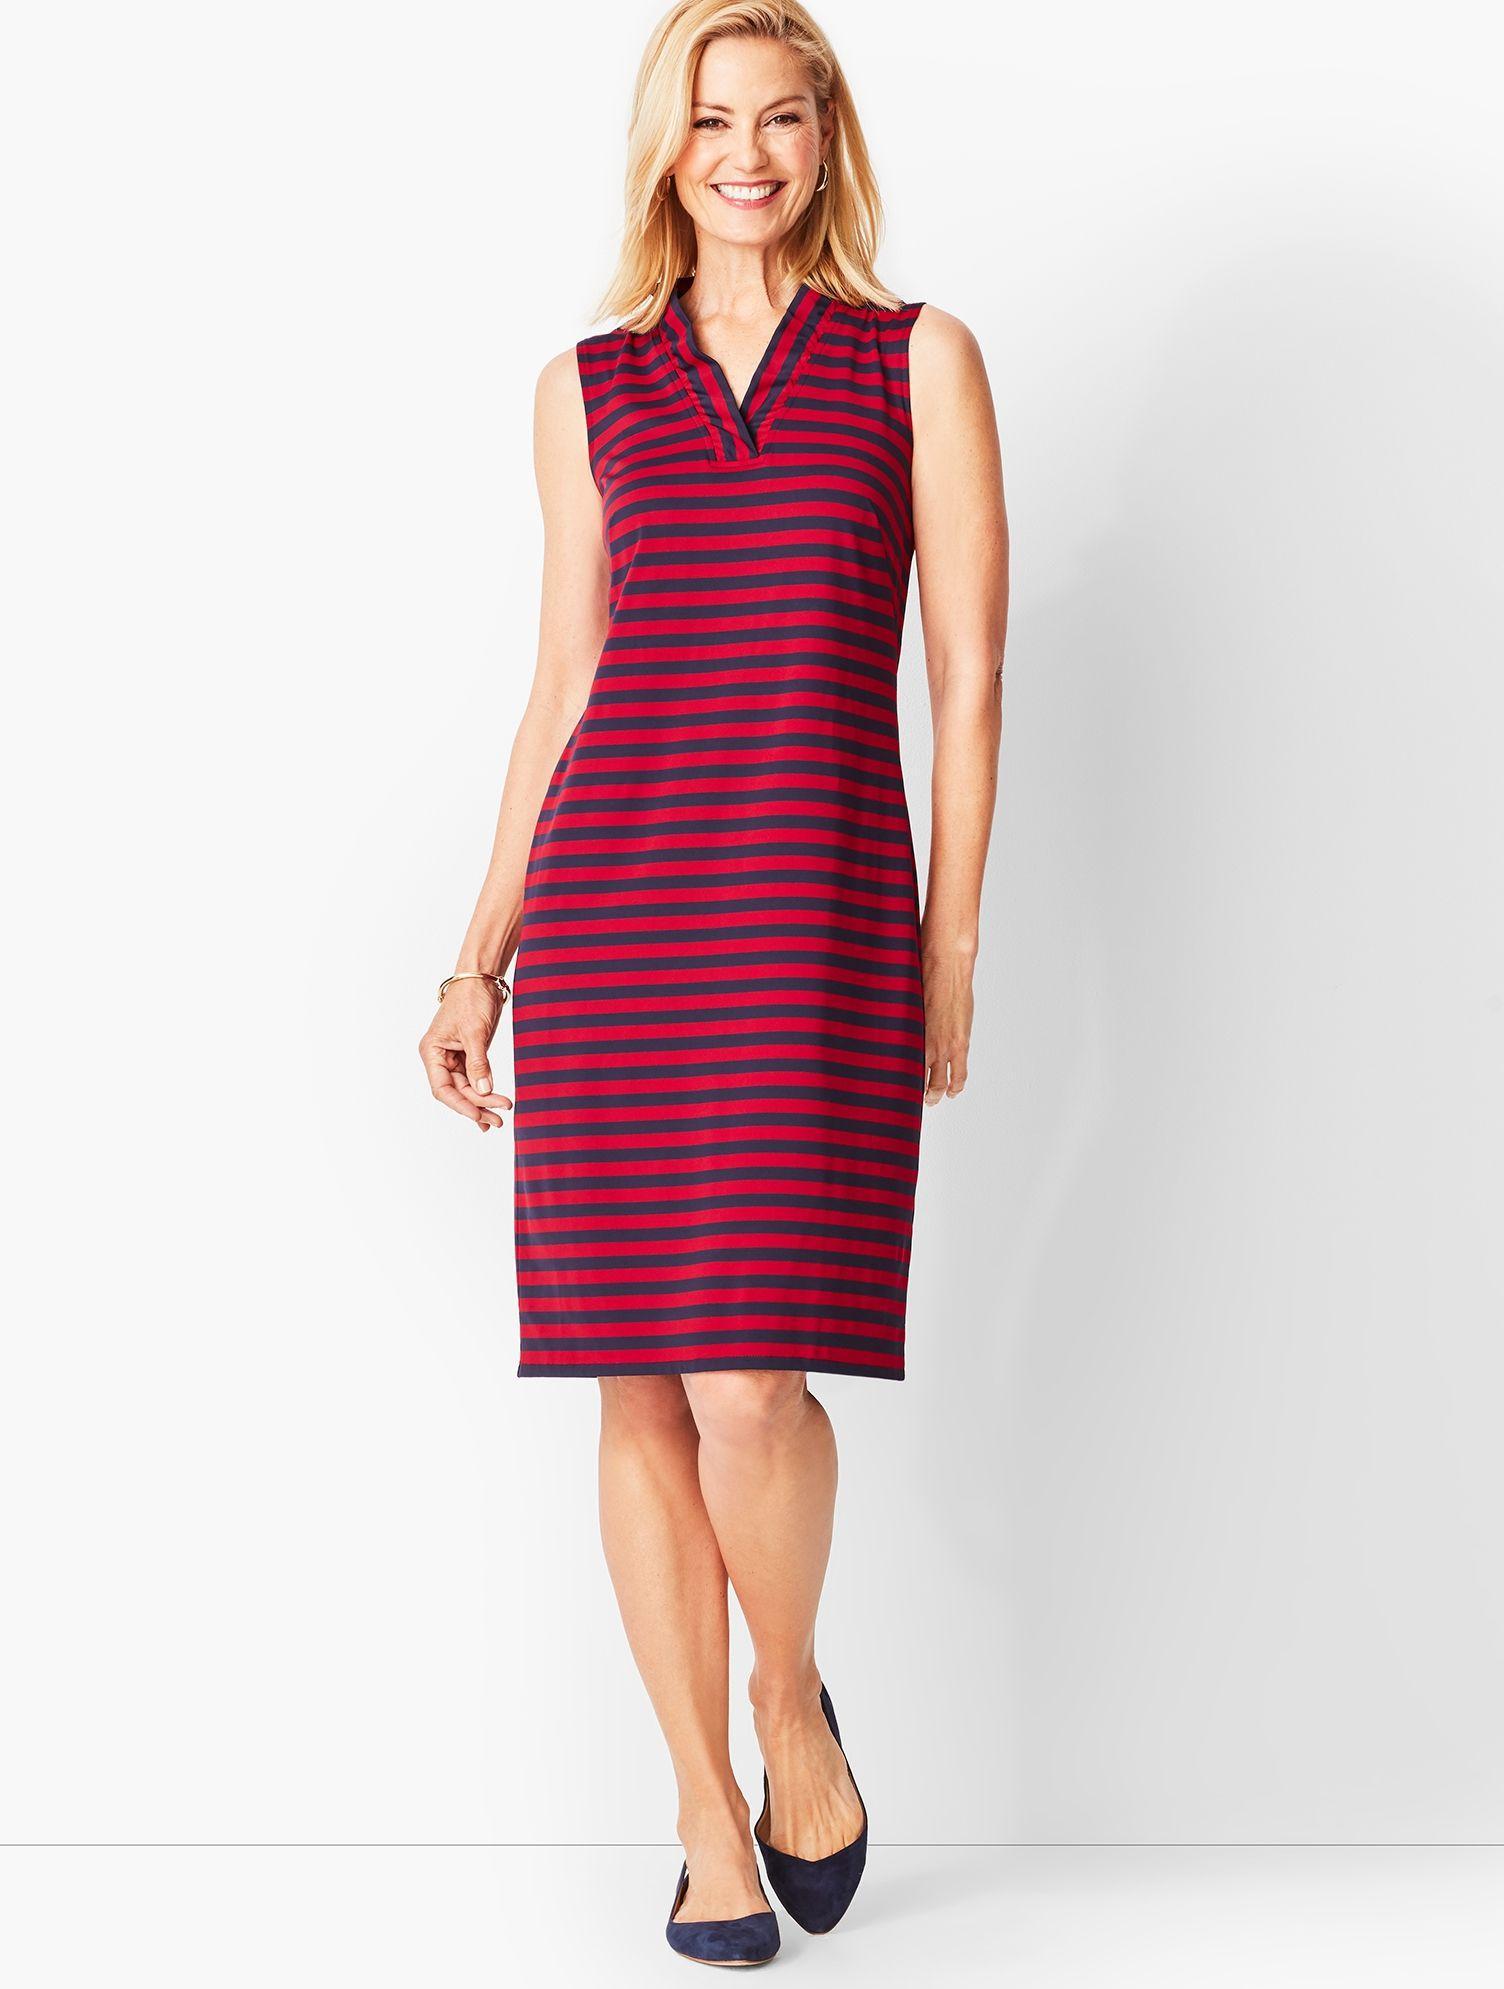 a8067b2a68 Lyst - Talbots Feminine Knit Jersey Dress in Red